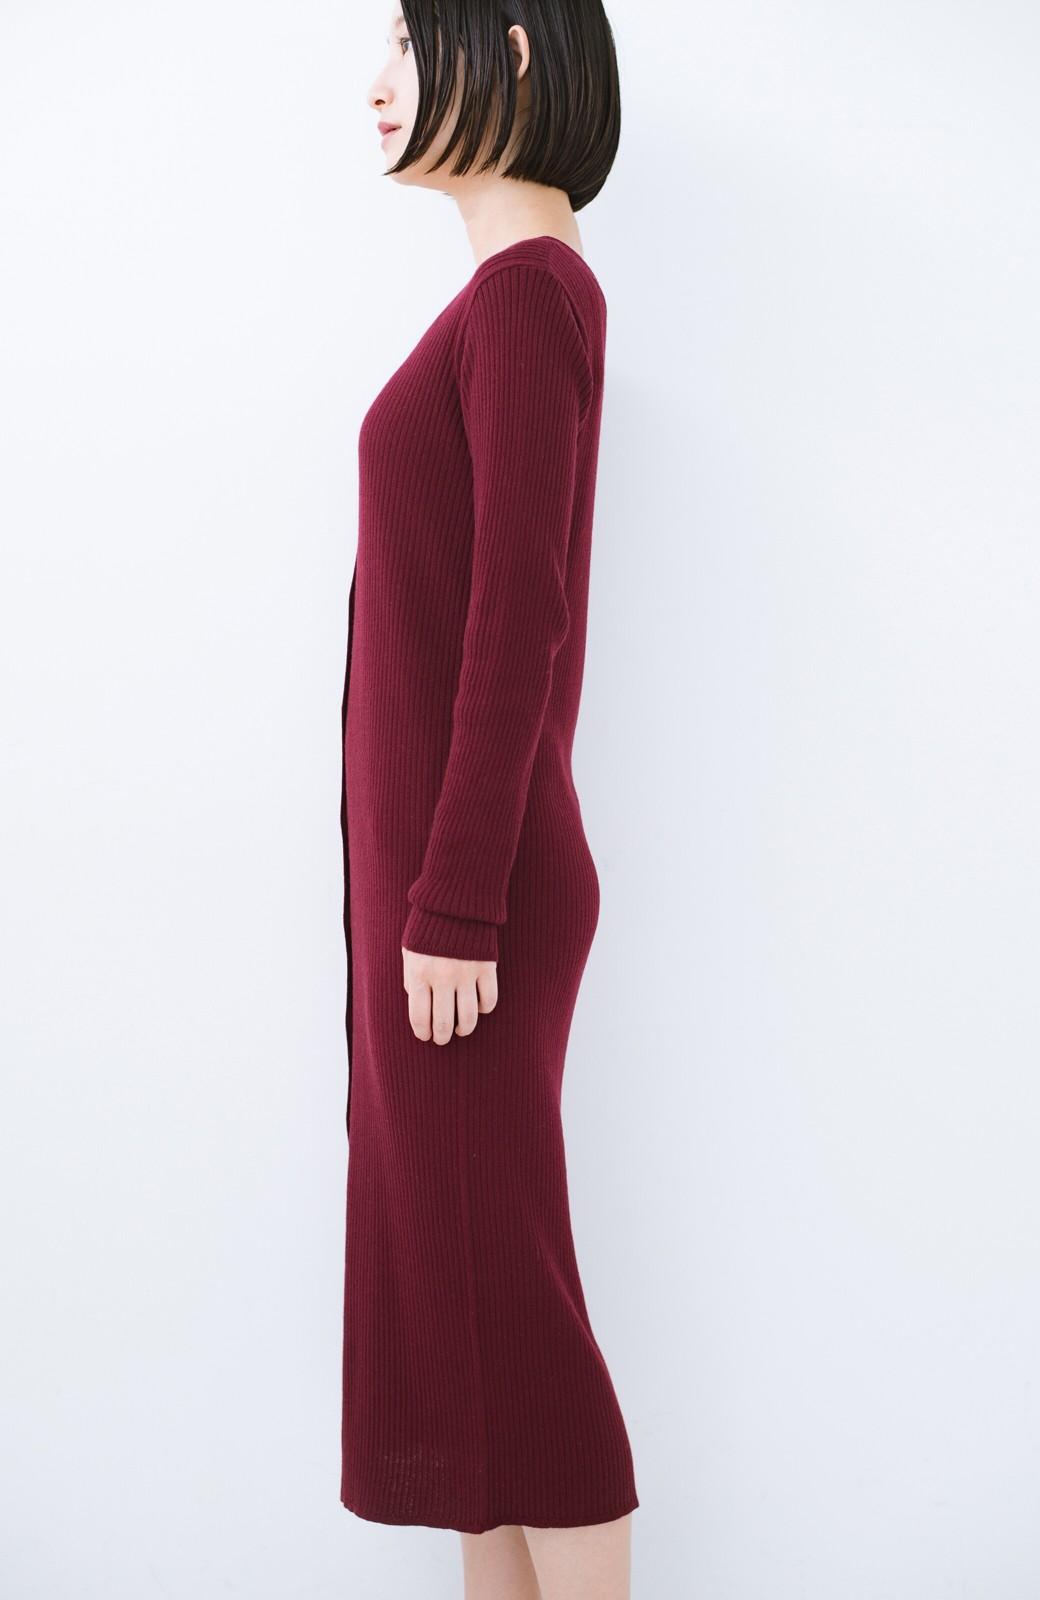 haco! 美シルエットがうれしい着方自由のオトナリブニットカーディガン by MAKORI <ボルドー>の商品写真15